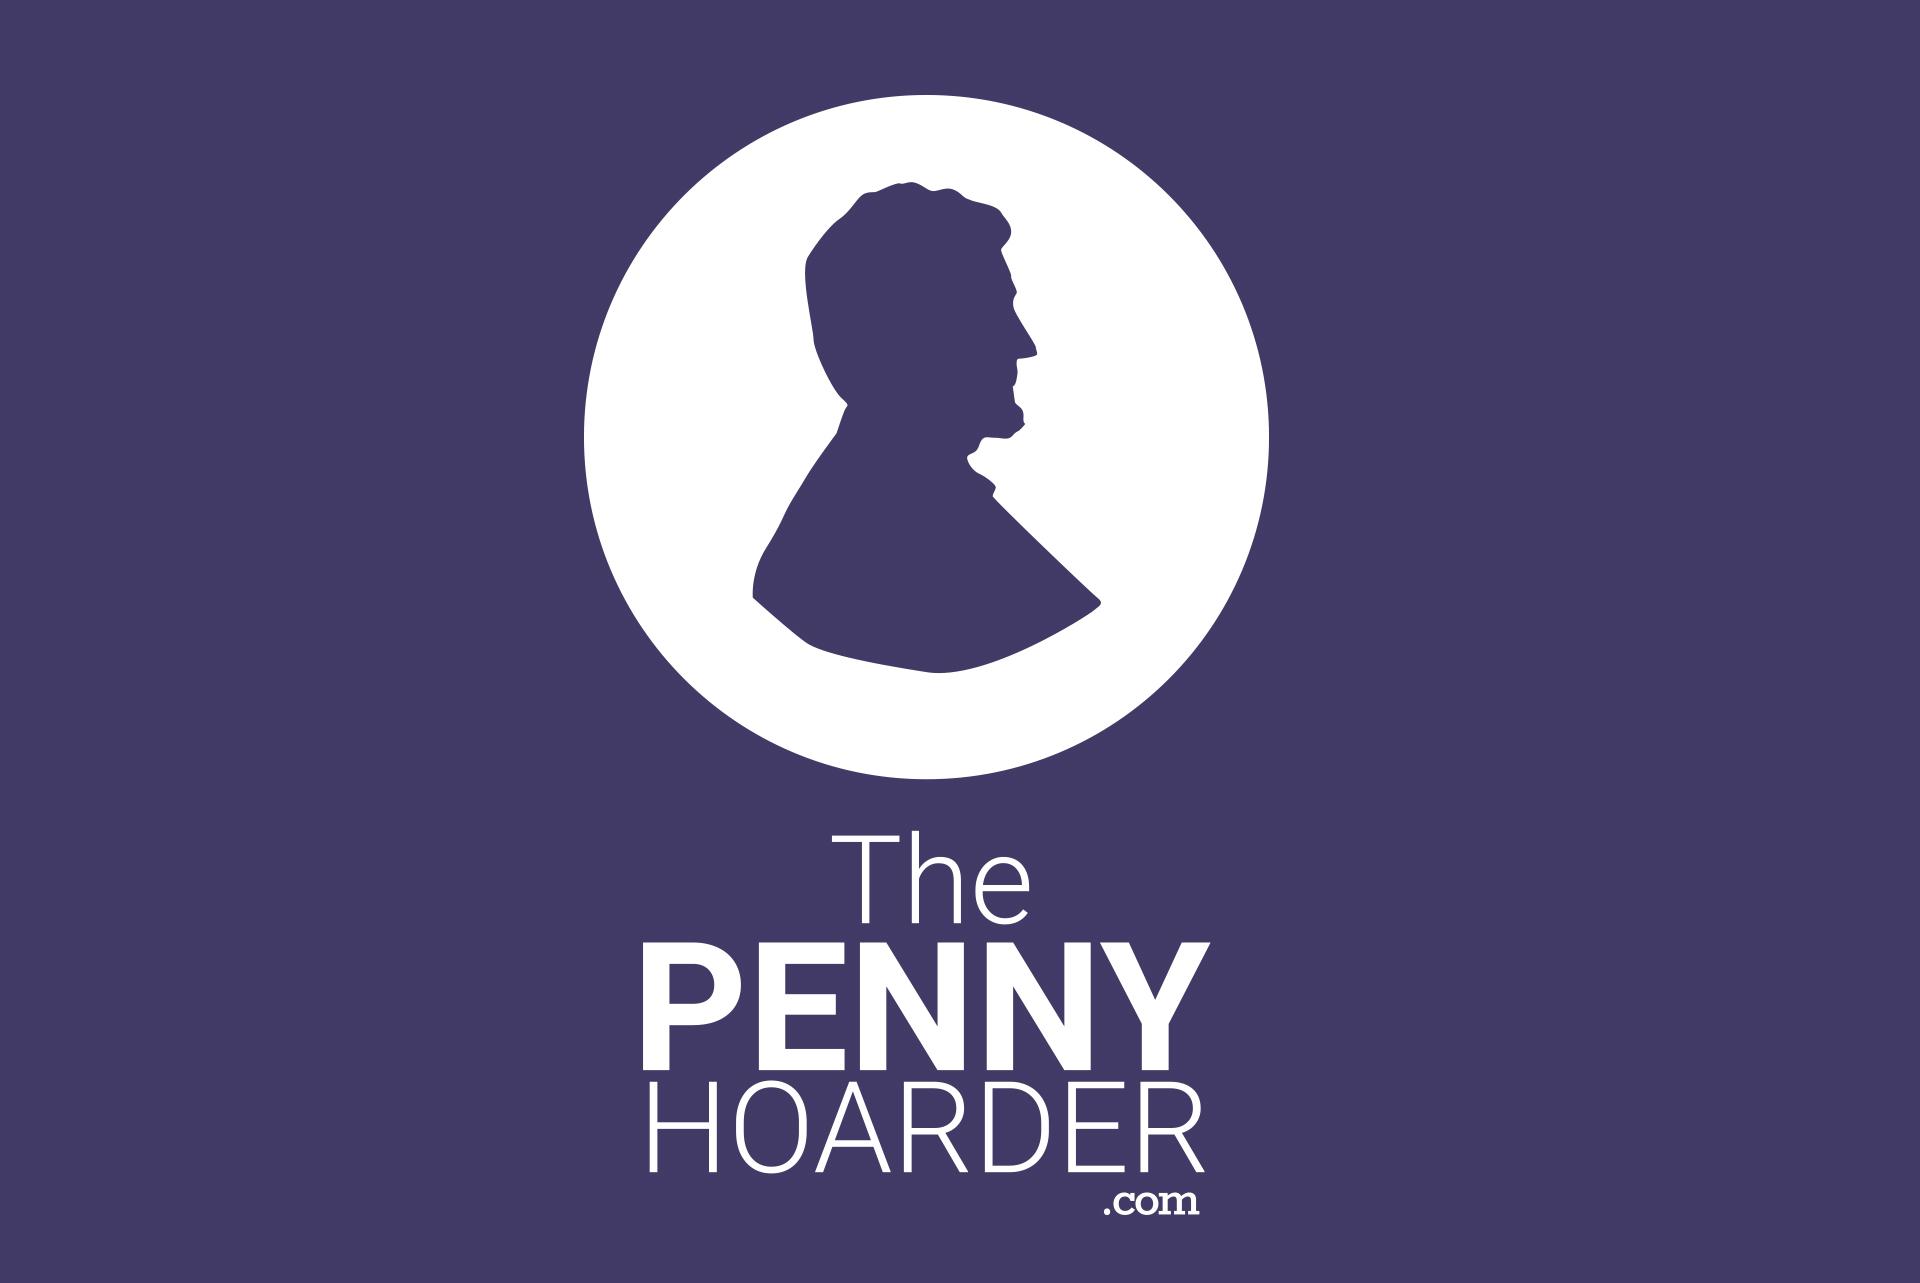 Penny%20hoarder%20logo press image 1476479528